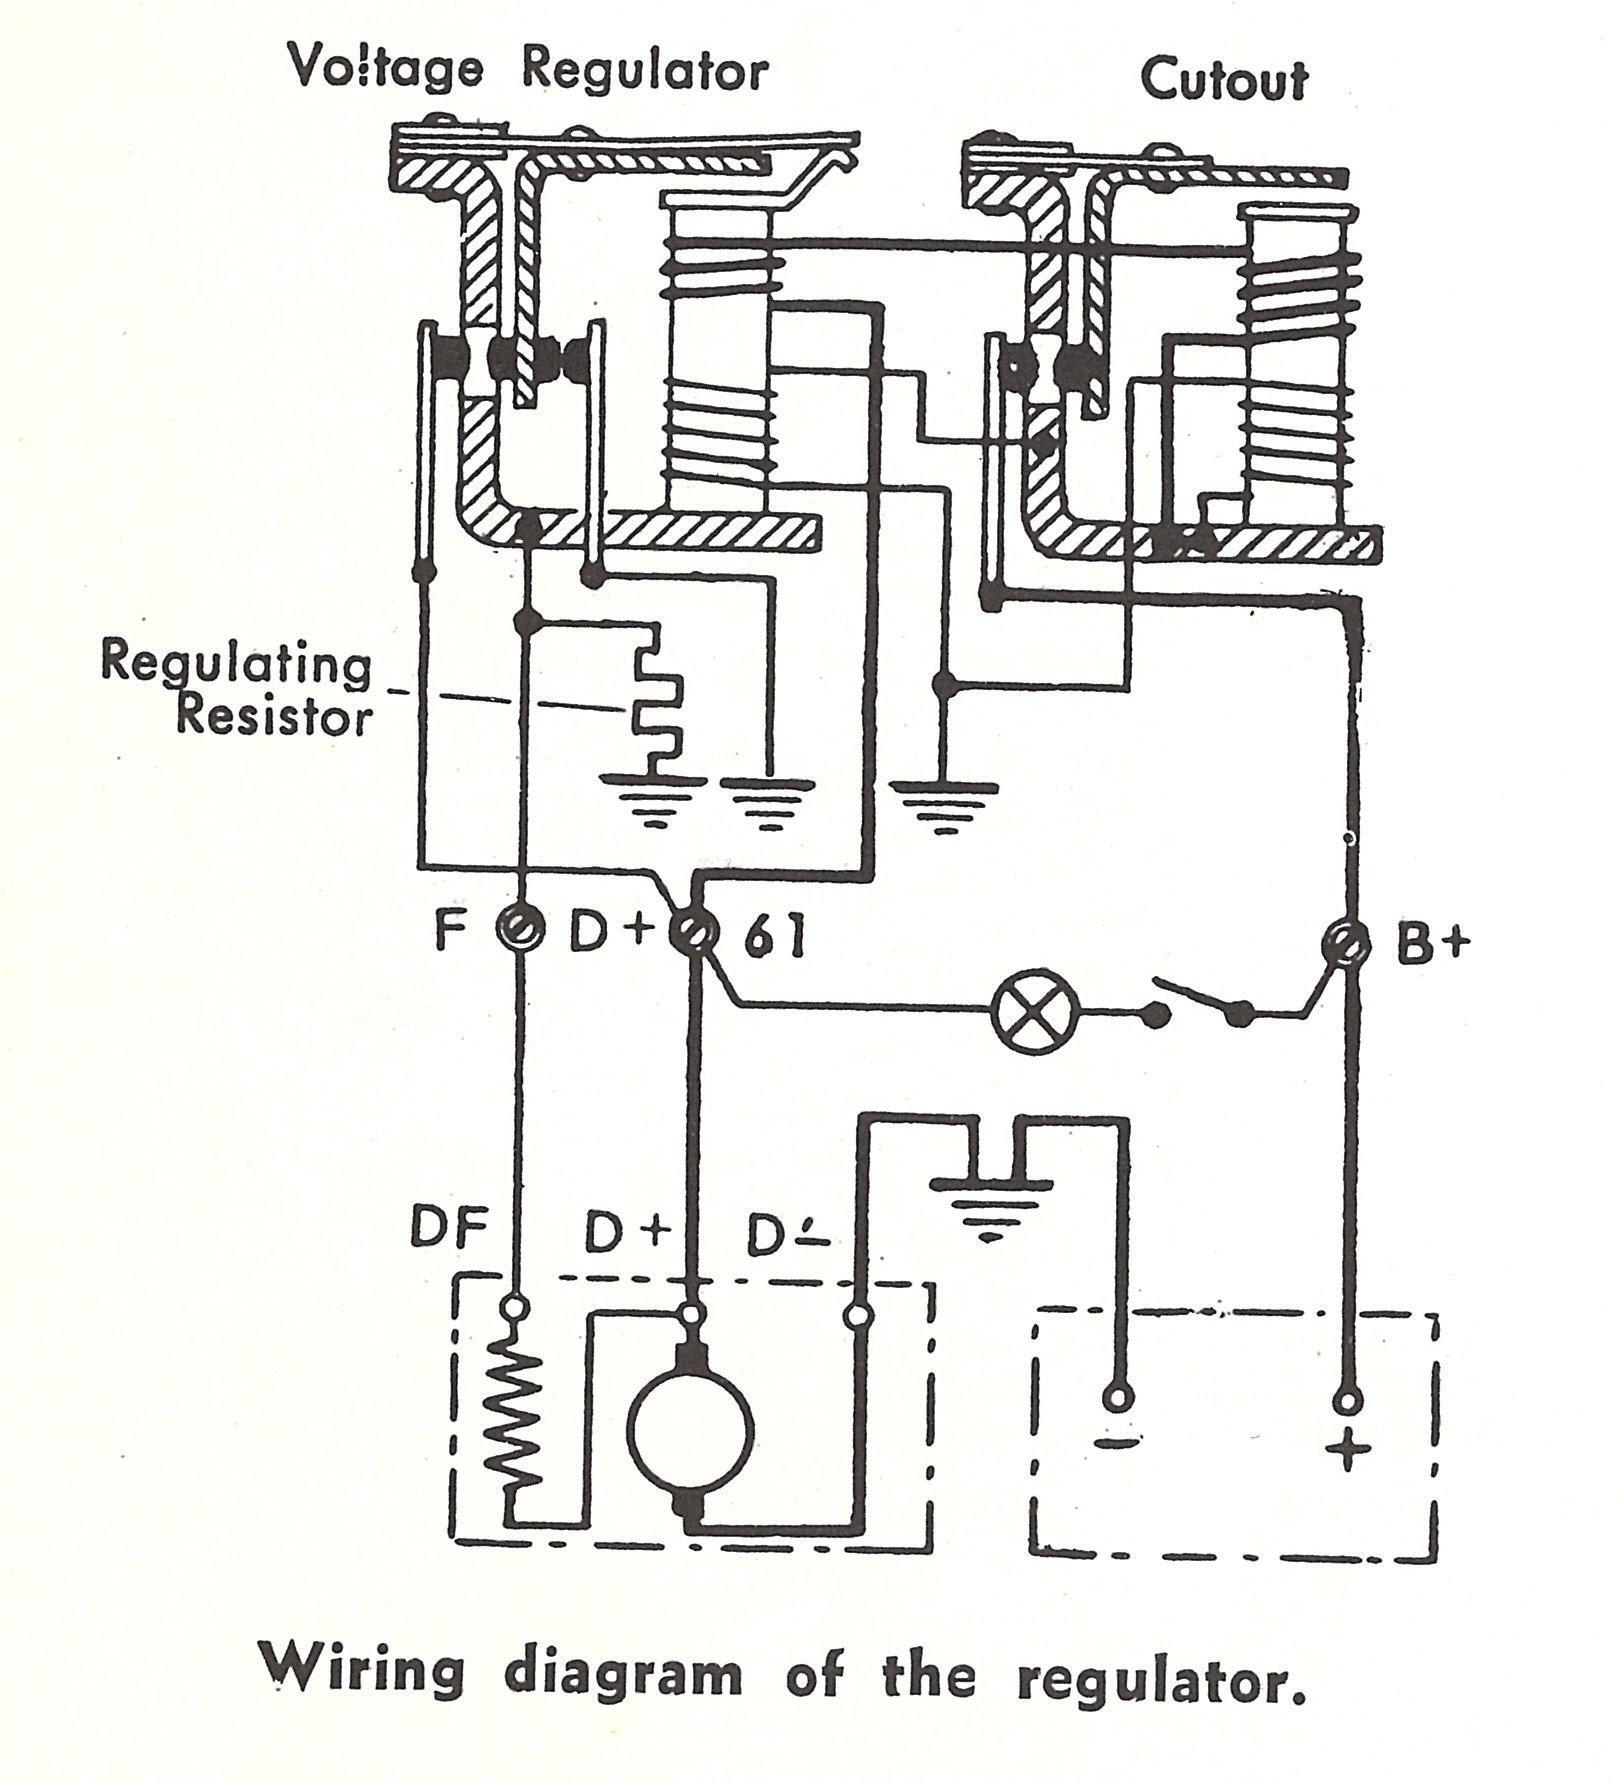 Kohler Voltage Regulator Wiring Diagram thesamba Split Bus View topic Adjusting Voltage Regulator Image Of Kohler Voltage Regulator Wiring Diagram